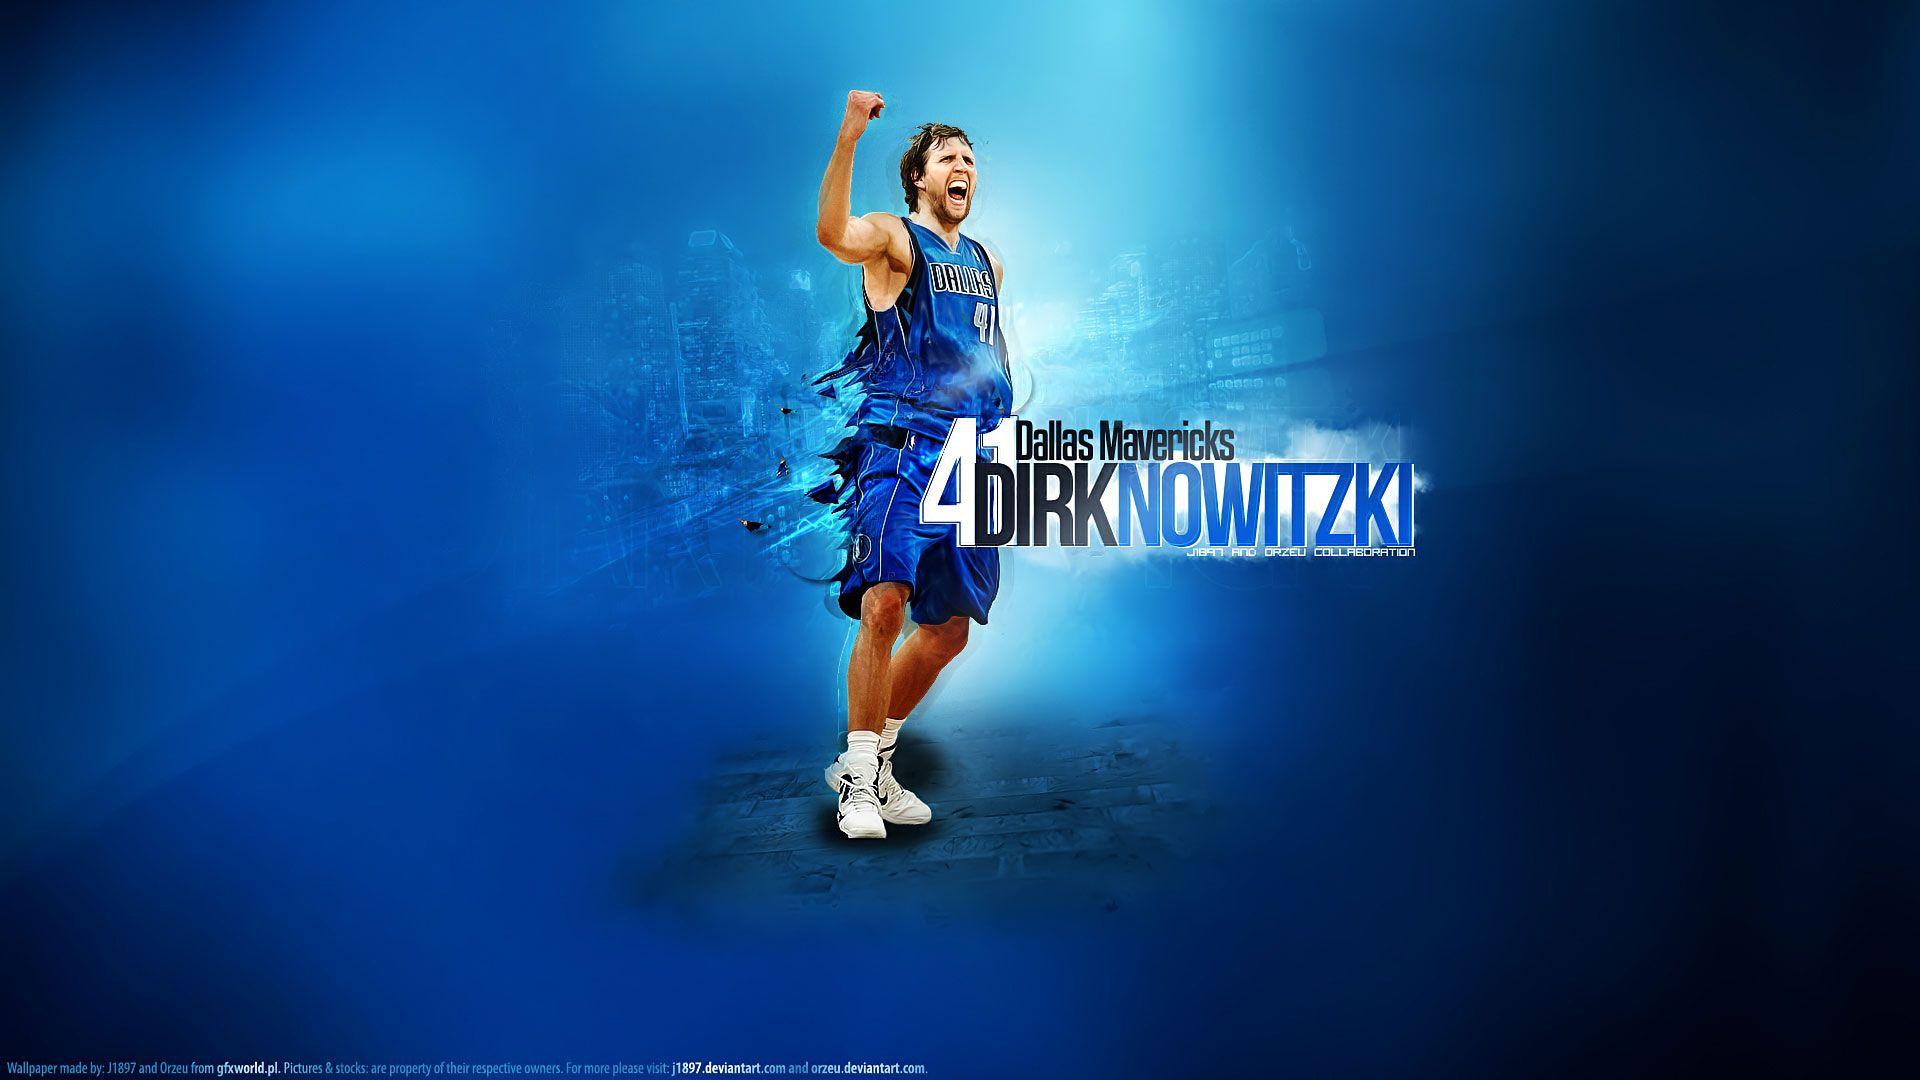 Dirk Nowitzki Wallpapers Basketball Players Dirk Nowitzki Dallas Mavericks